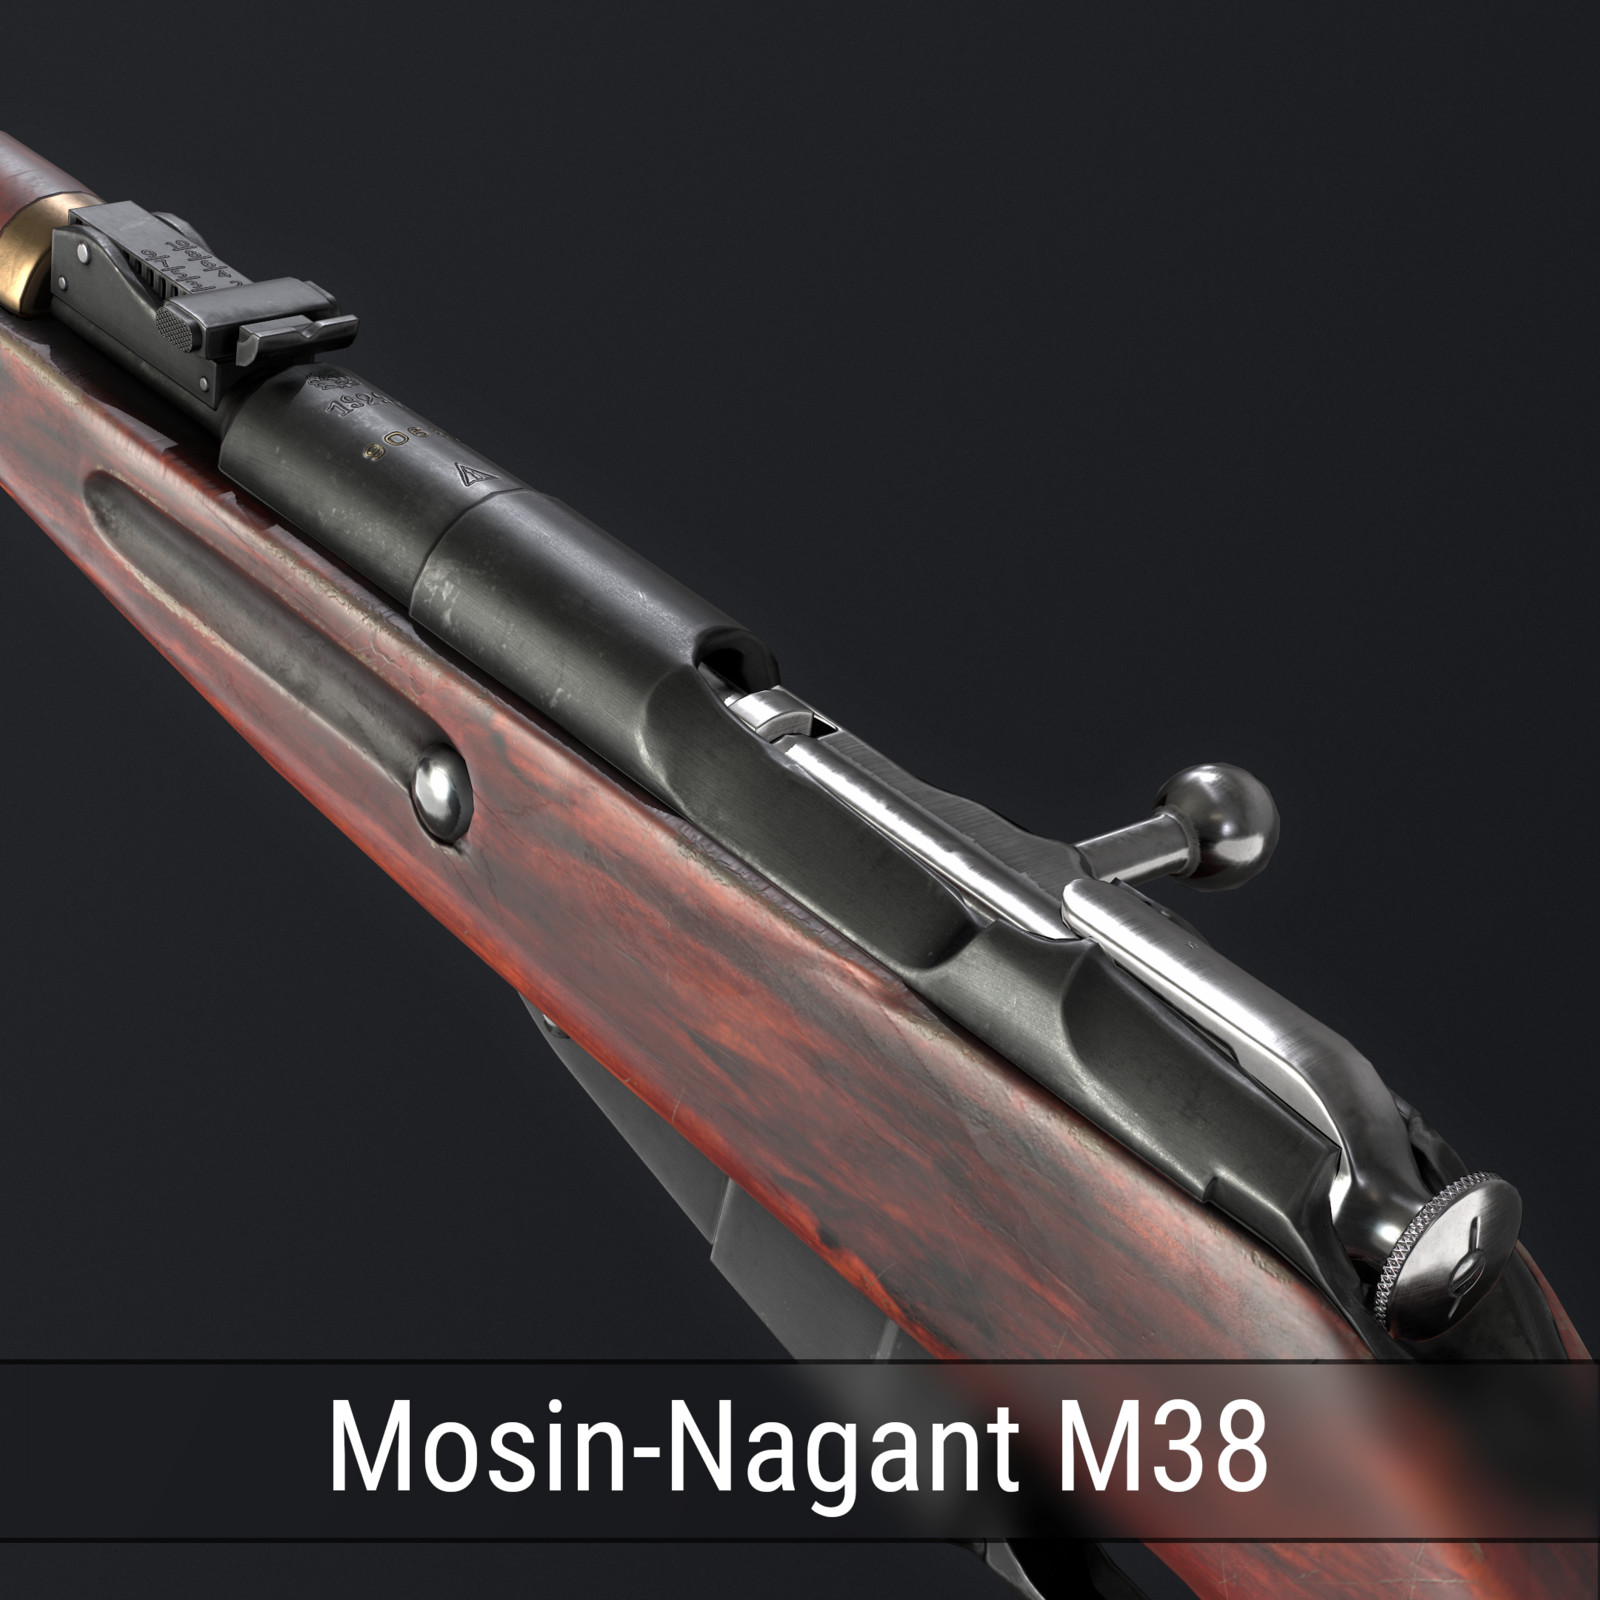 Mosin-Nagant M38